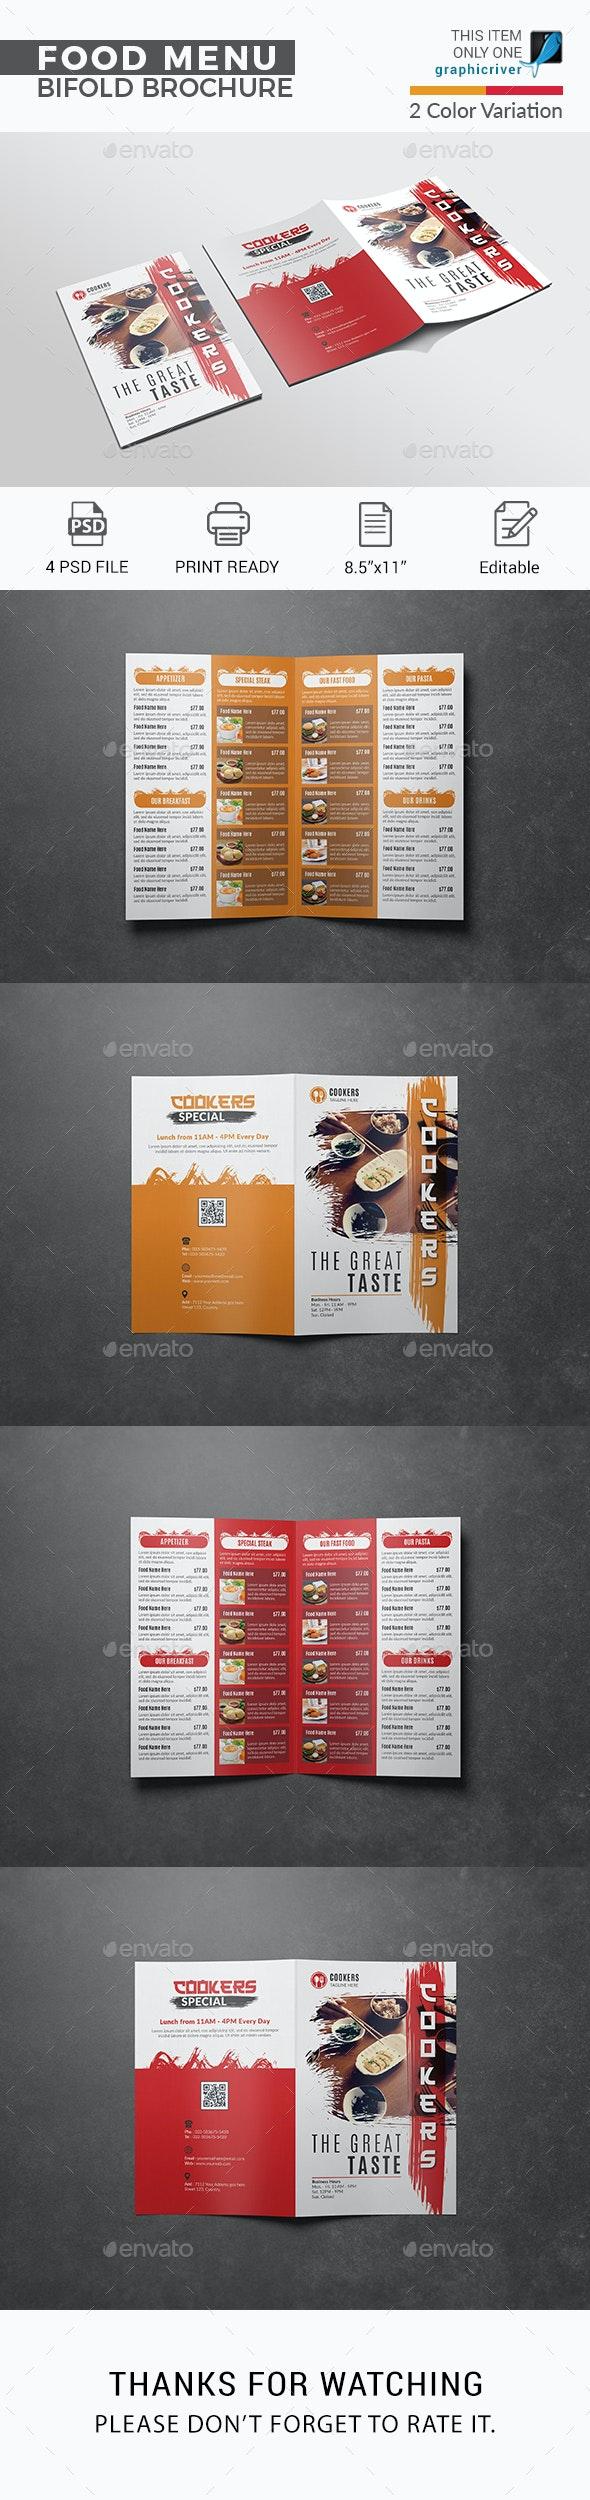 Food Bifold Brochure - Food Menus Print Templates